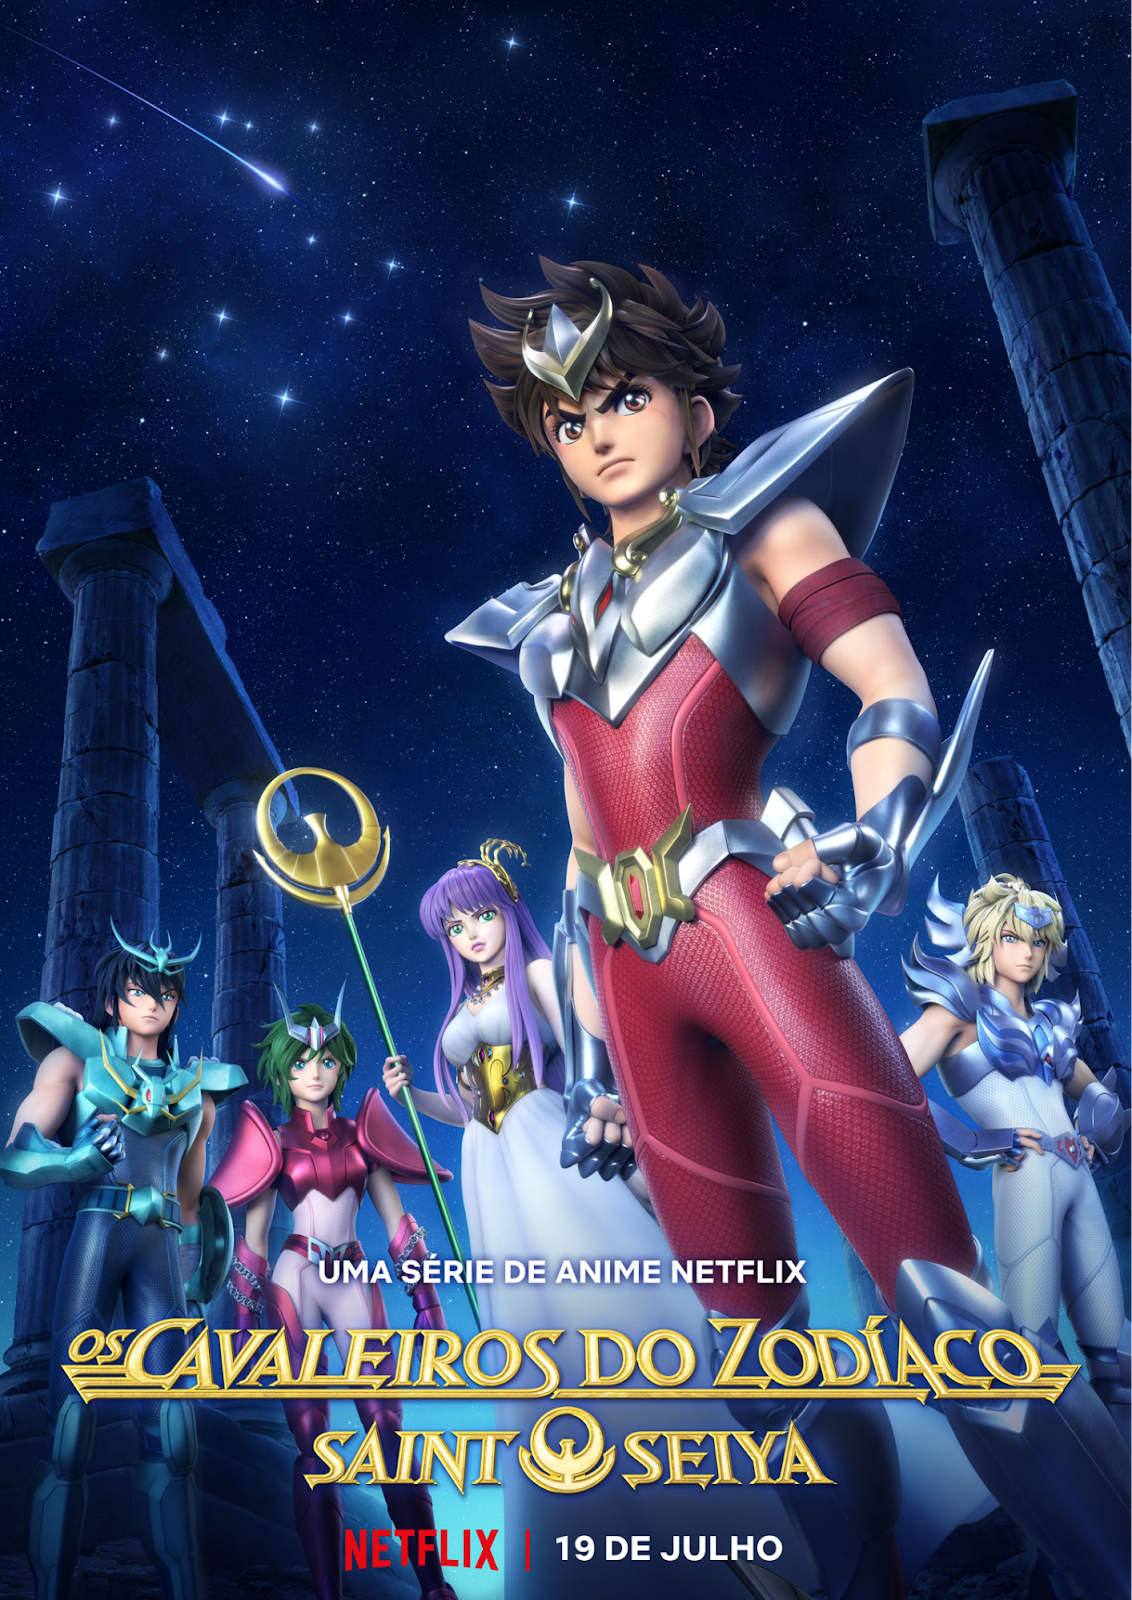 Saint Seiya Cavaleiros do Zodíaco Netflix